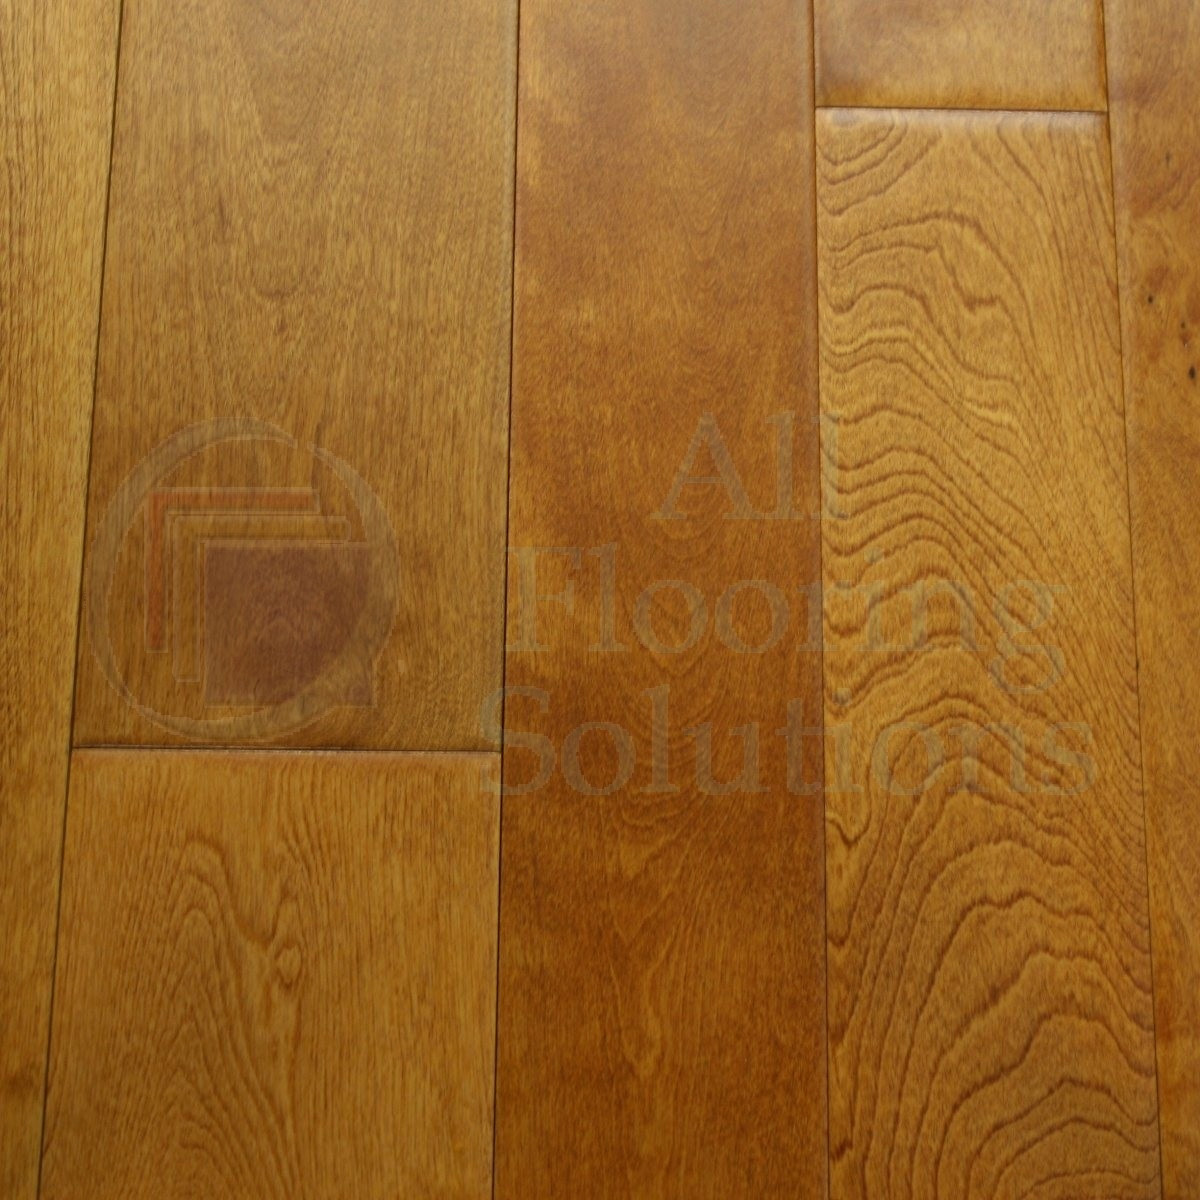 cost to install engineered hardwood floors of bruce hardwood floor refinishing best of engineered hardwood floor throughout bruce hardwood floor refinishing best of engineered hardwood floor shaw flooring chicago hardwood flooring